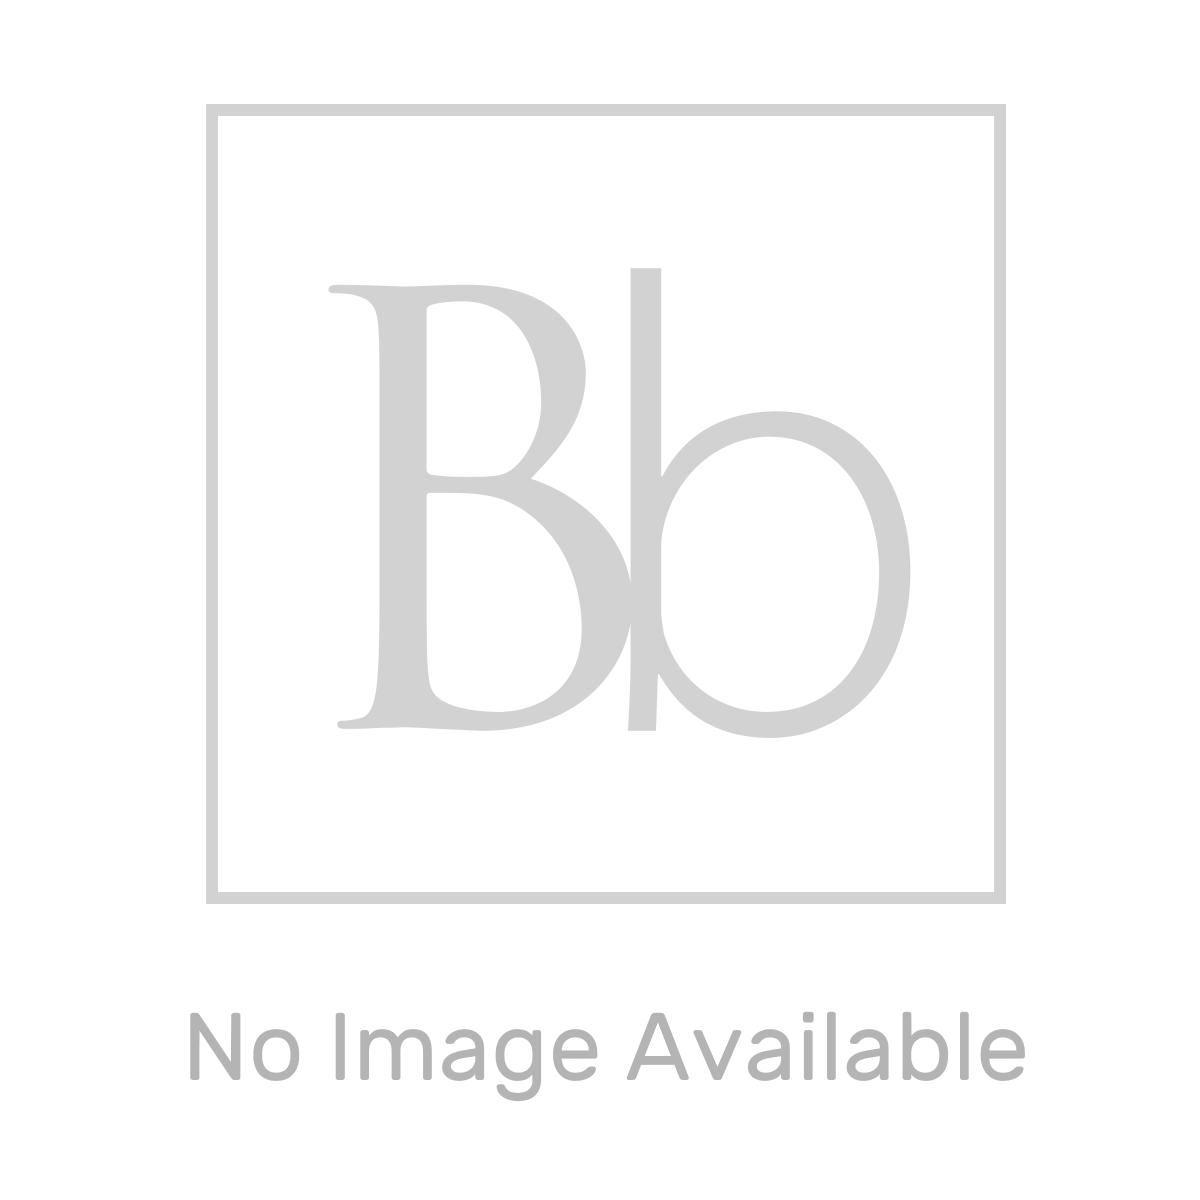 BTL Volta White Gloss Wood Effect Front Bath Panel 1700mm